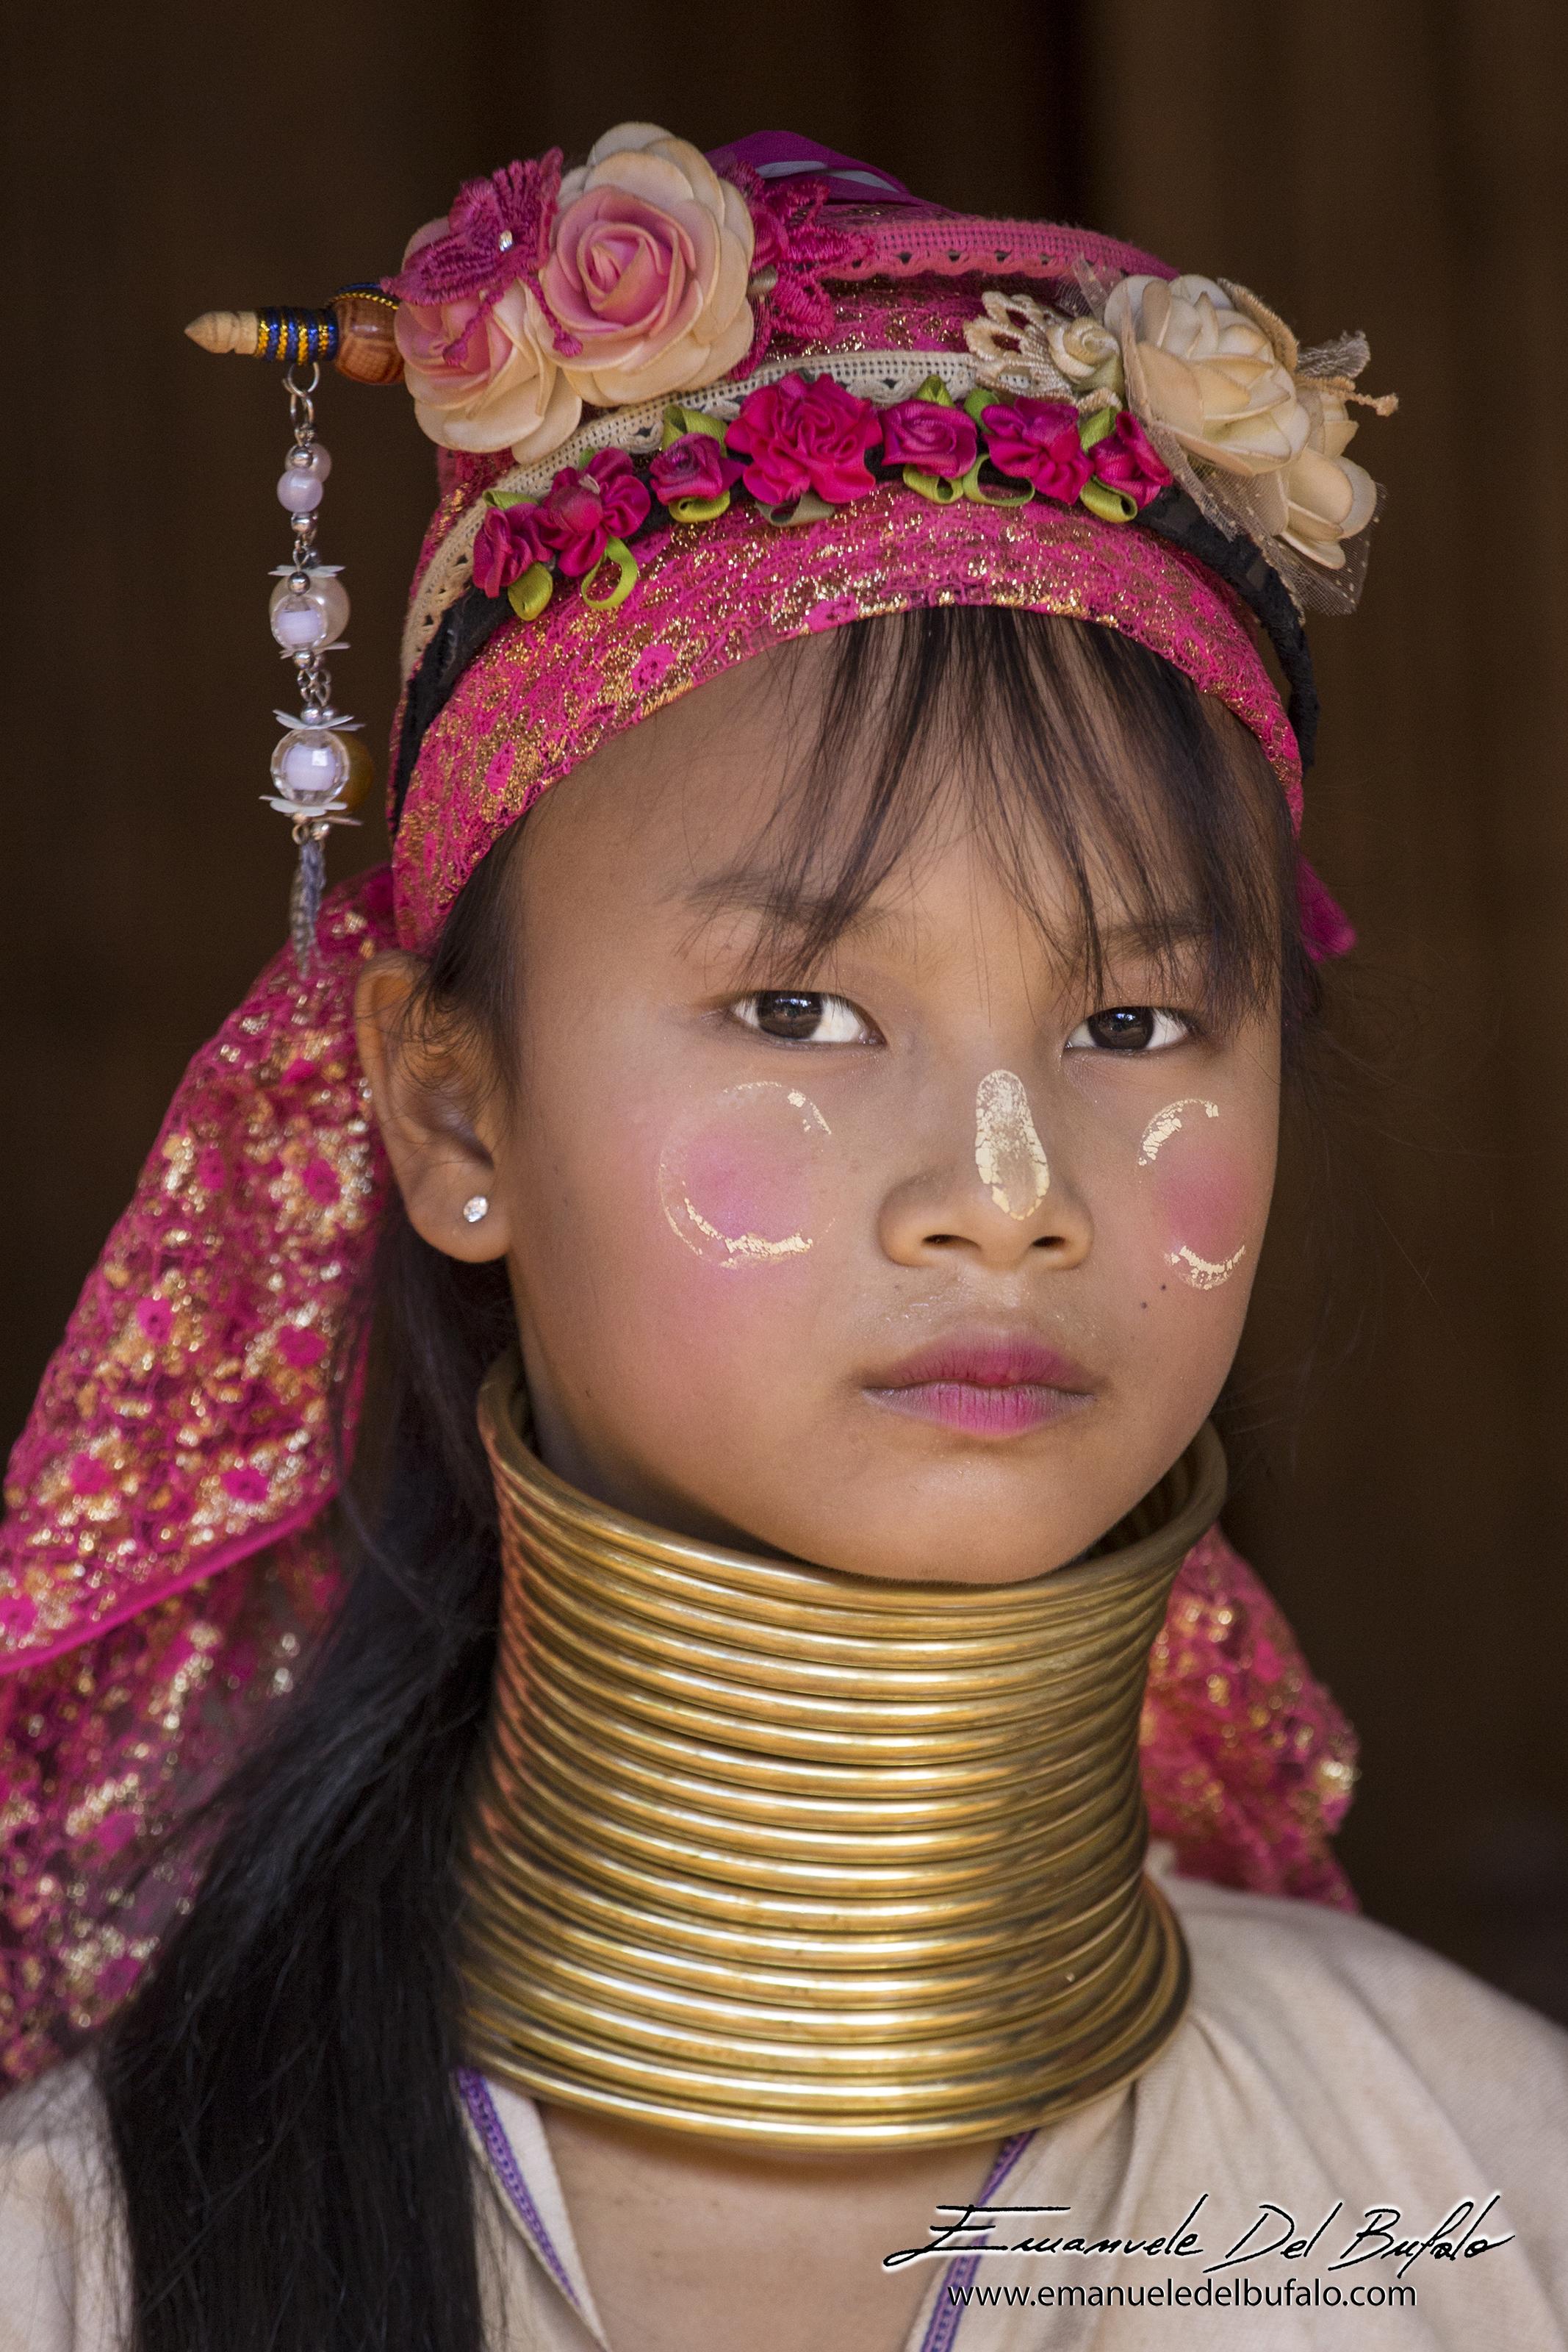 www.emanueledelbufalo.com #thailand #asia #chiang_mai #people #portrait #karen #culture #girl